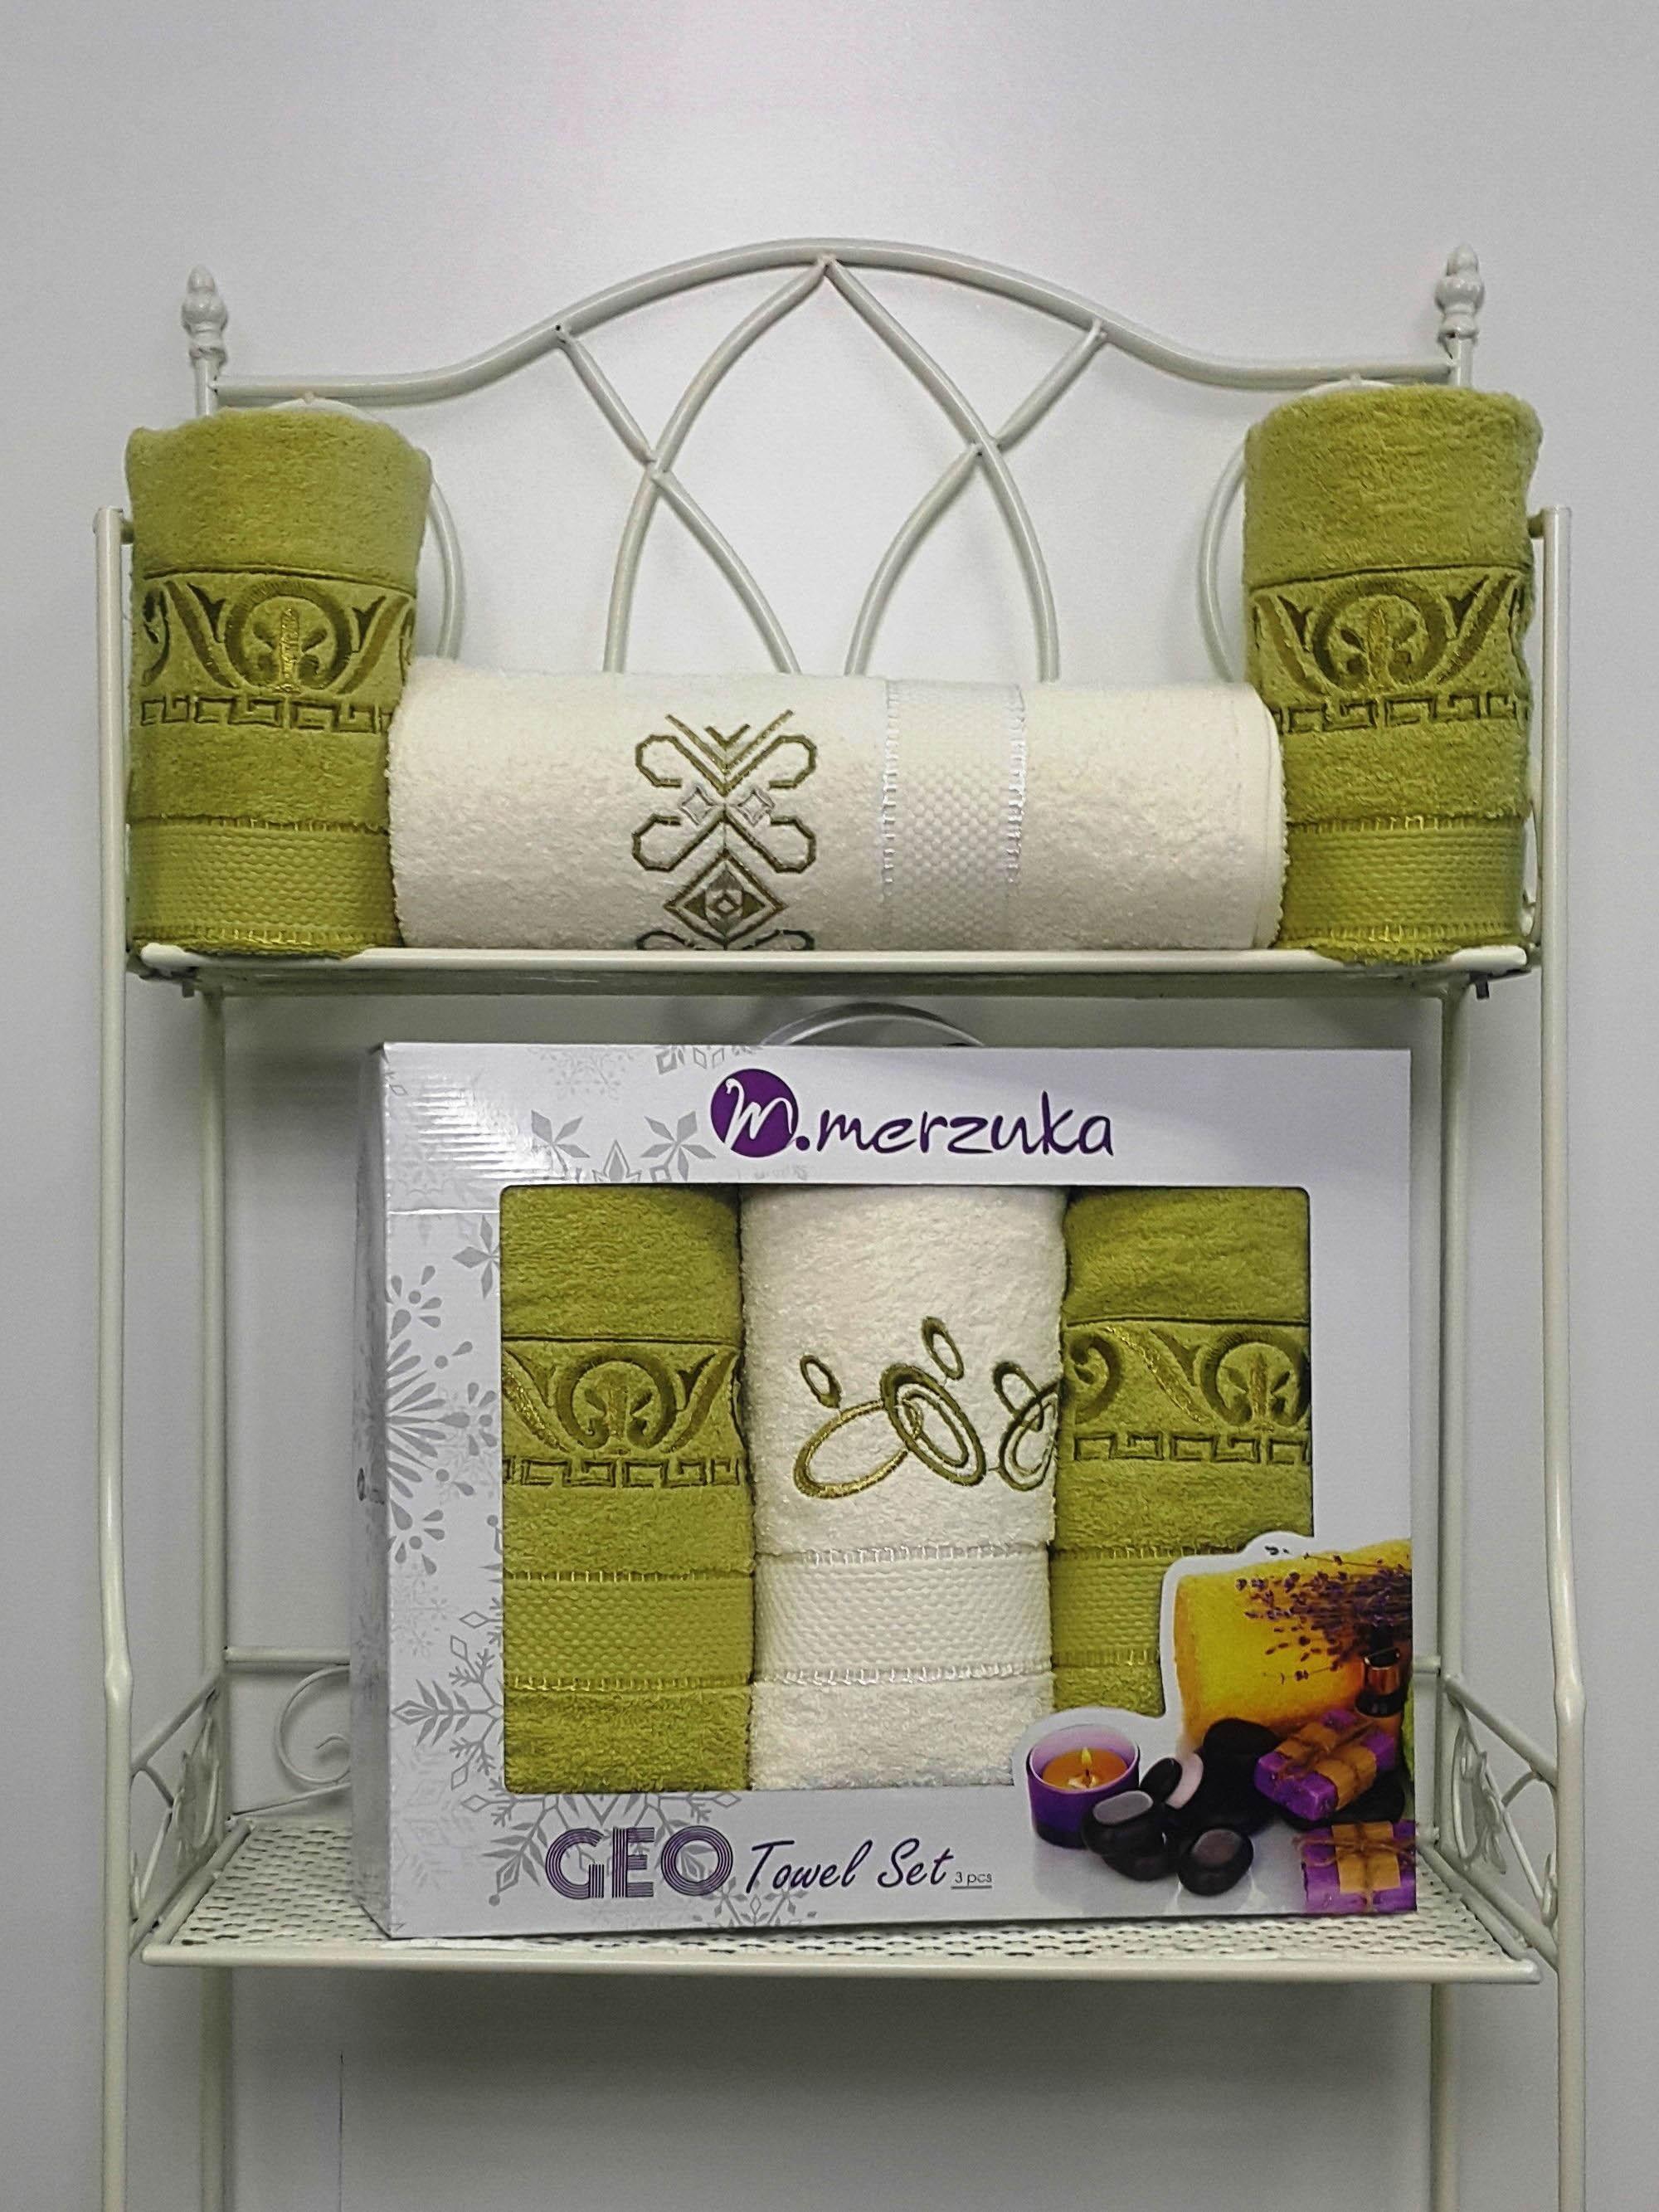 Полотенца Oran Merzuka Полотенце Geо Цвет: Зелёный (Набор) набор из 3 полотенец merzuka sakura 50х90 2 70х140 8432 оранжевый